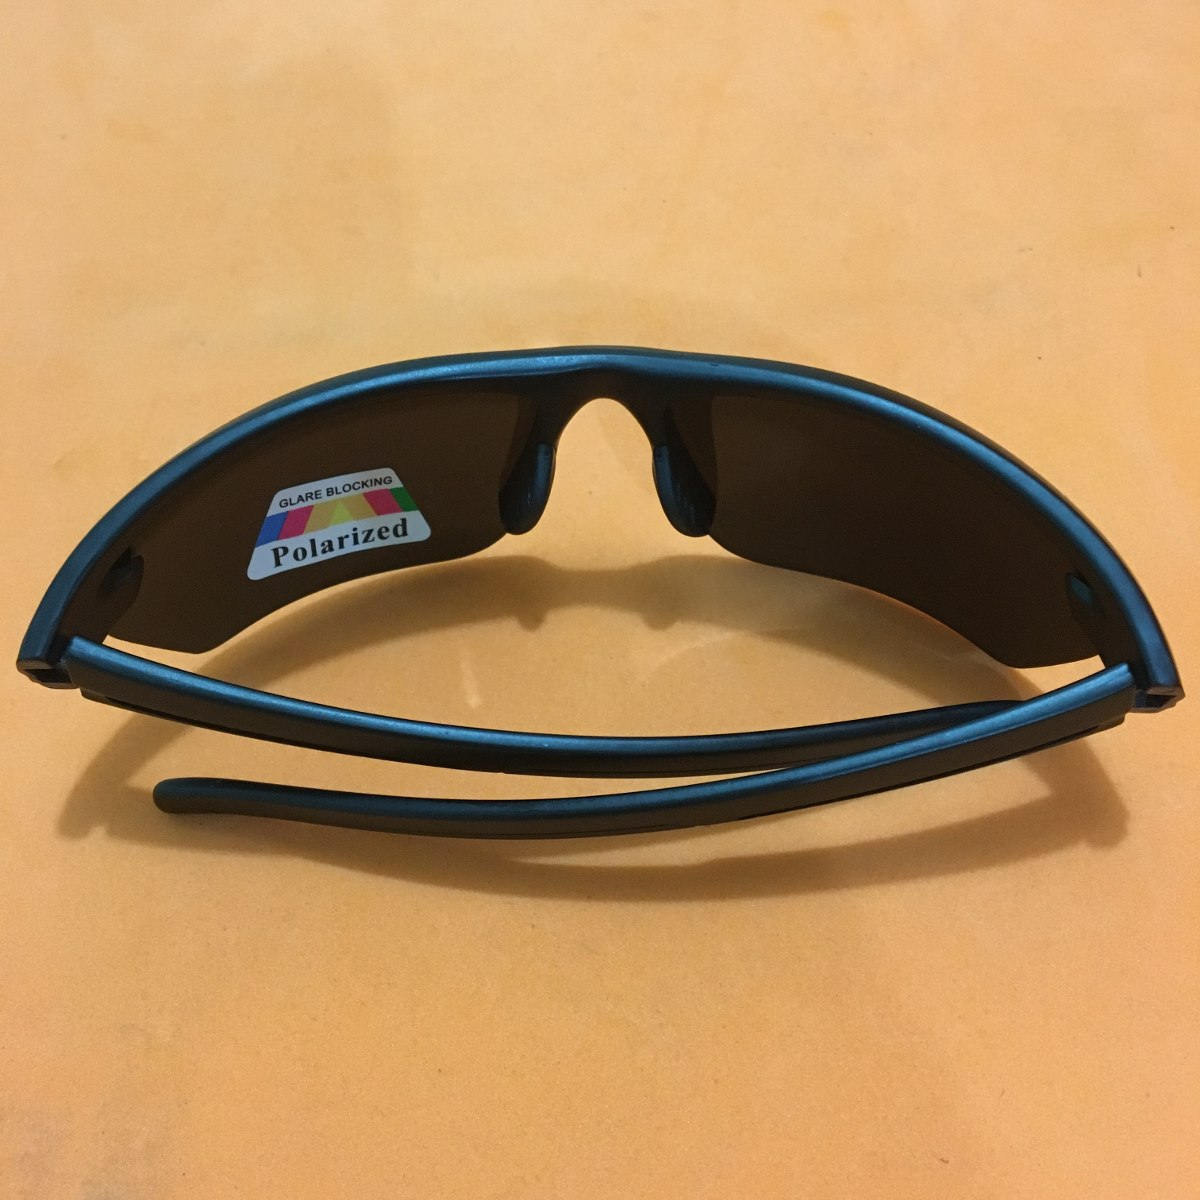 5c5c4ac8147c0 oculos polarizado espelhado anti-reflexos maruri dz 6624. Carregando zoom.